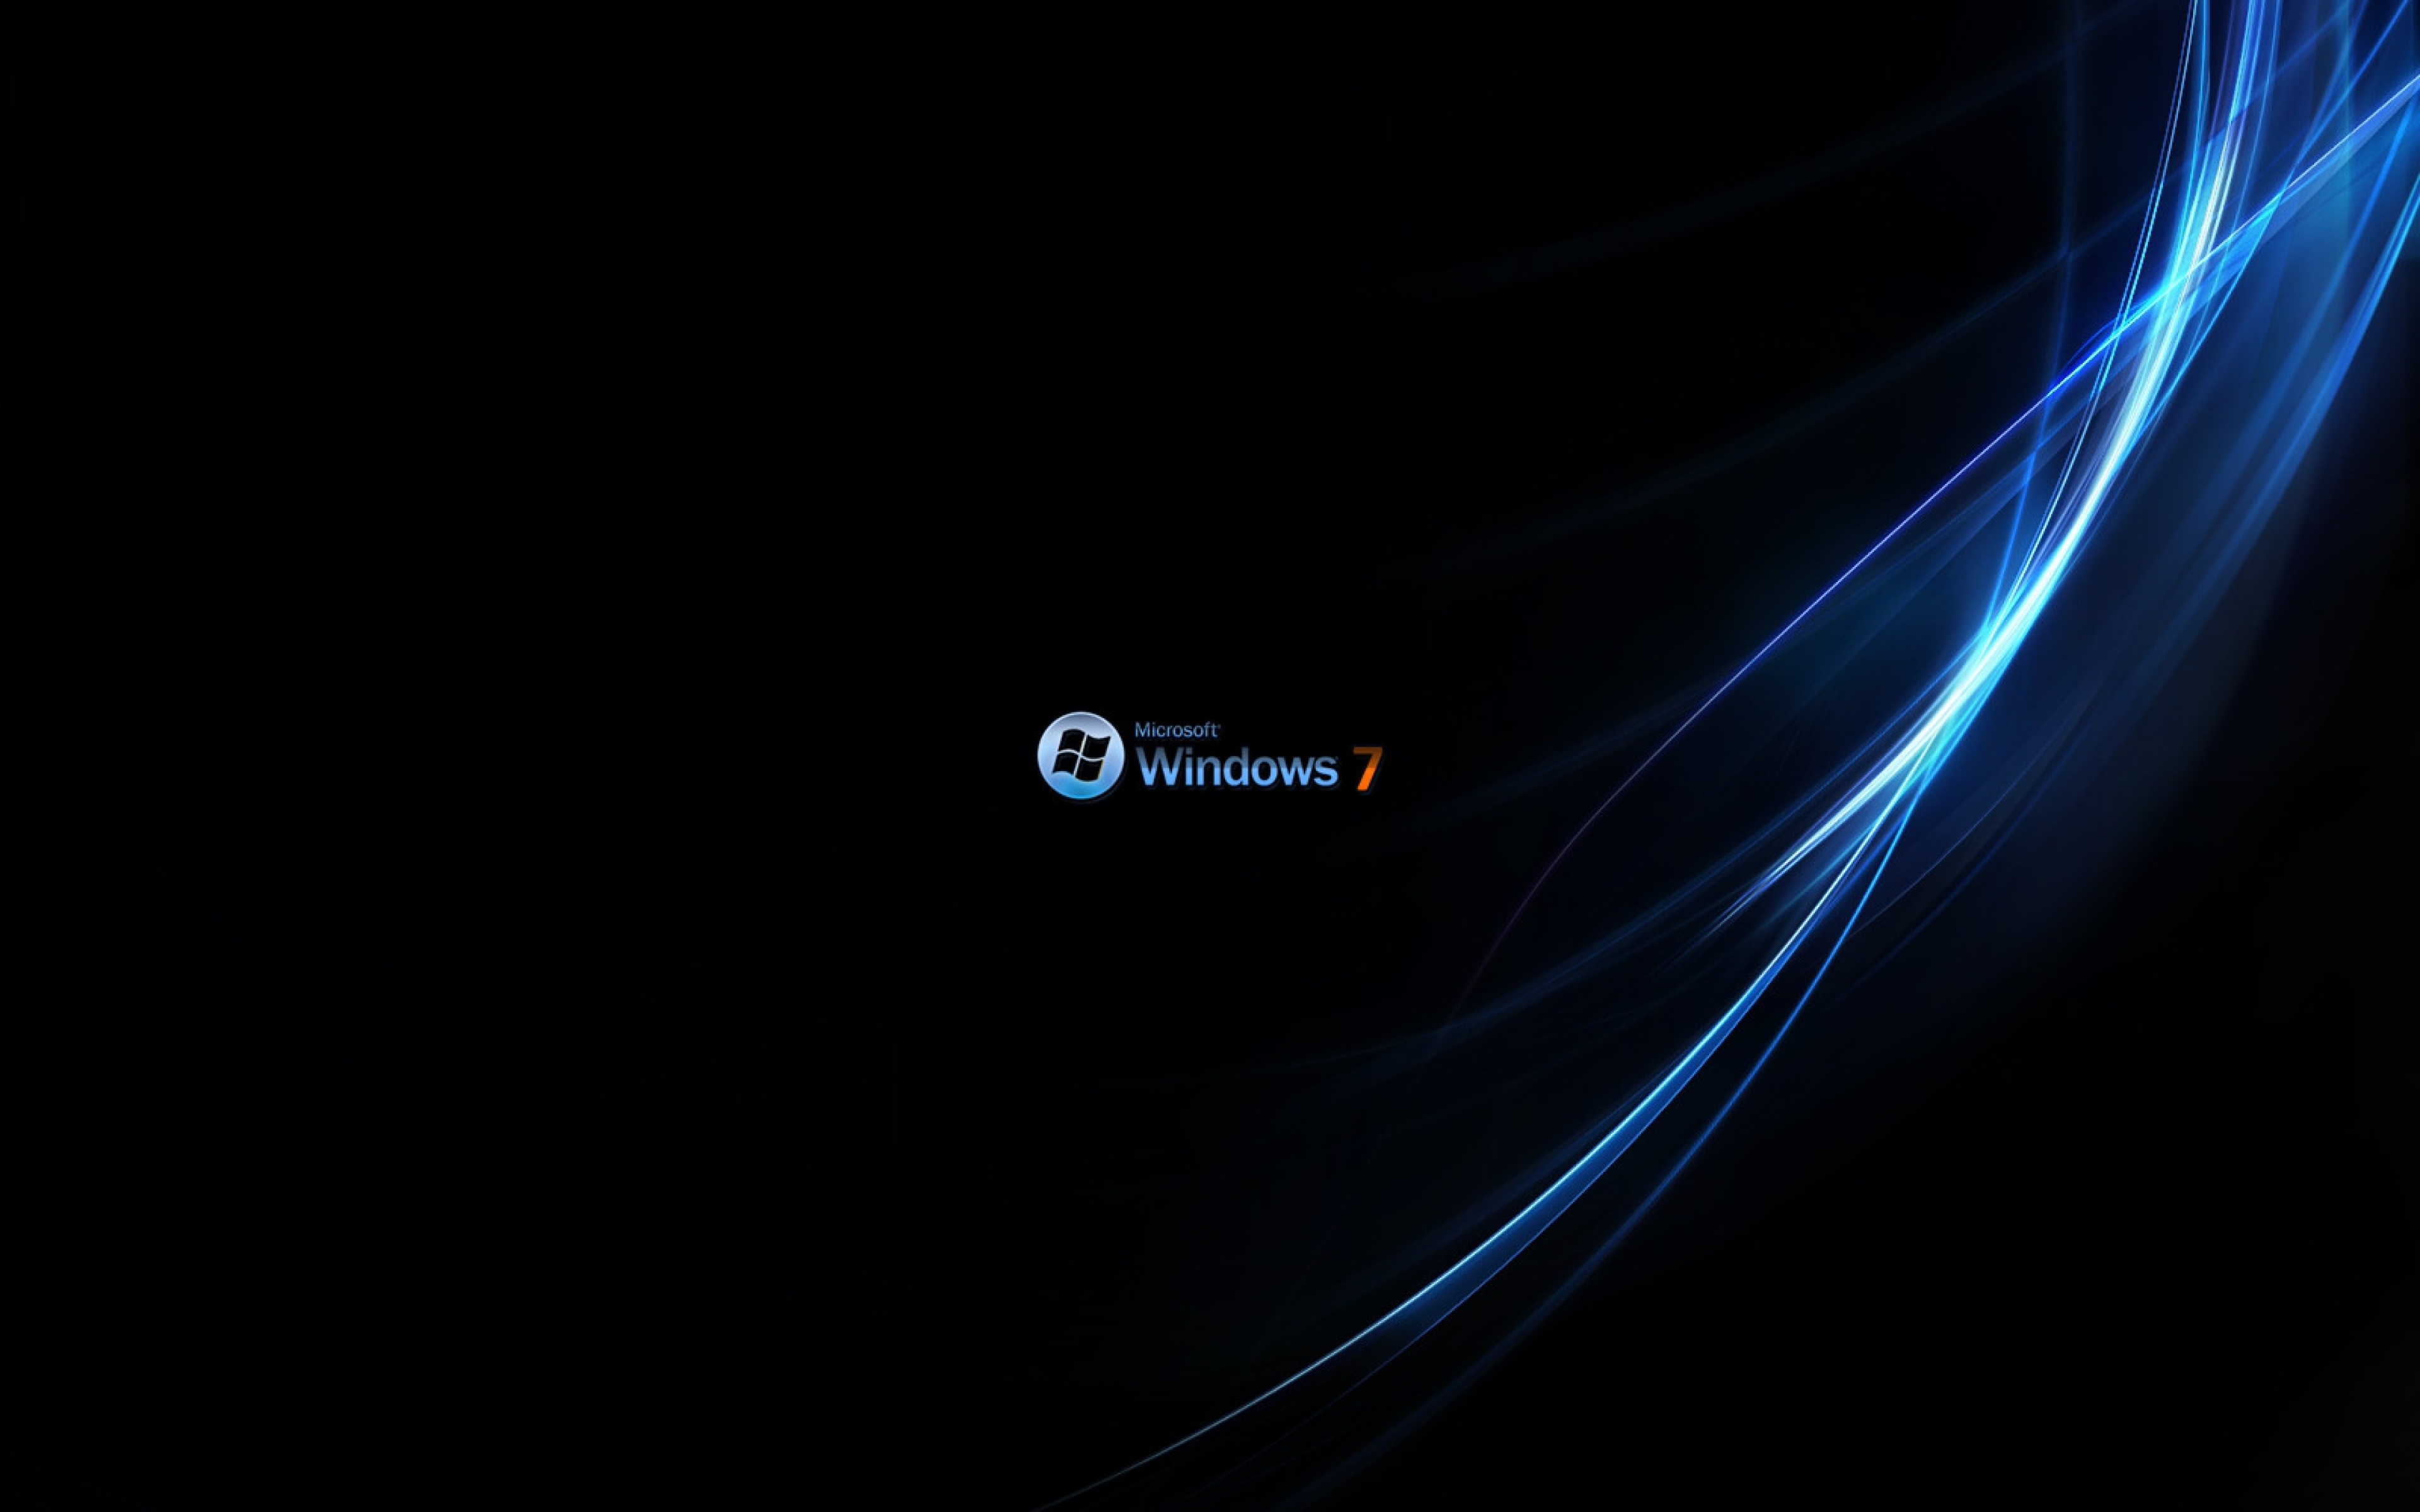 Windows System Background Dark Wallpaper Background Ultra HD 4K 3840x2400